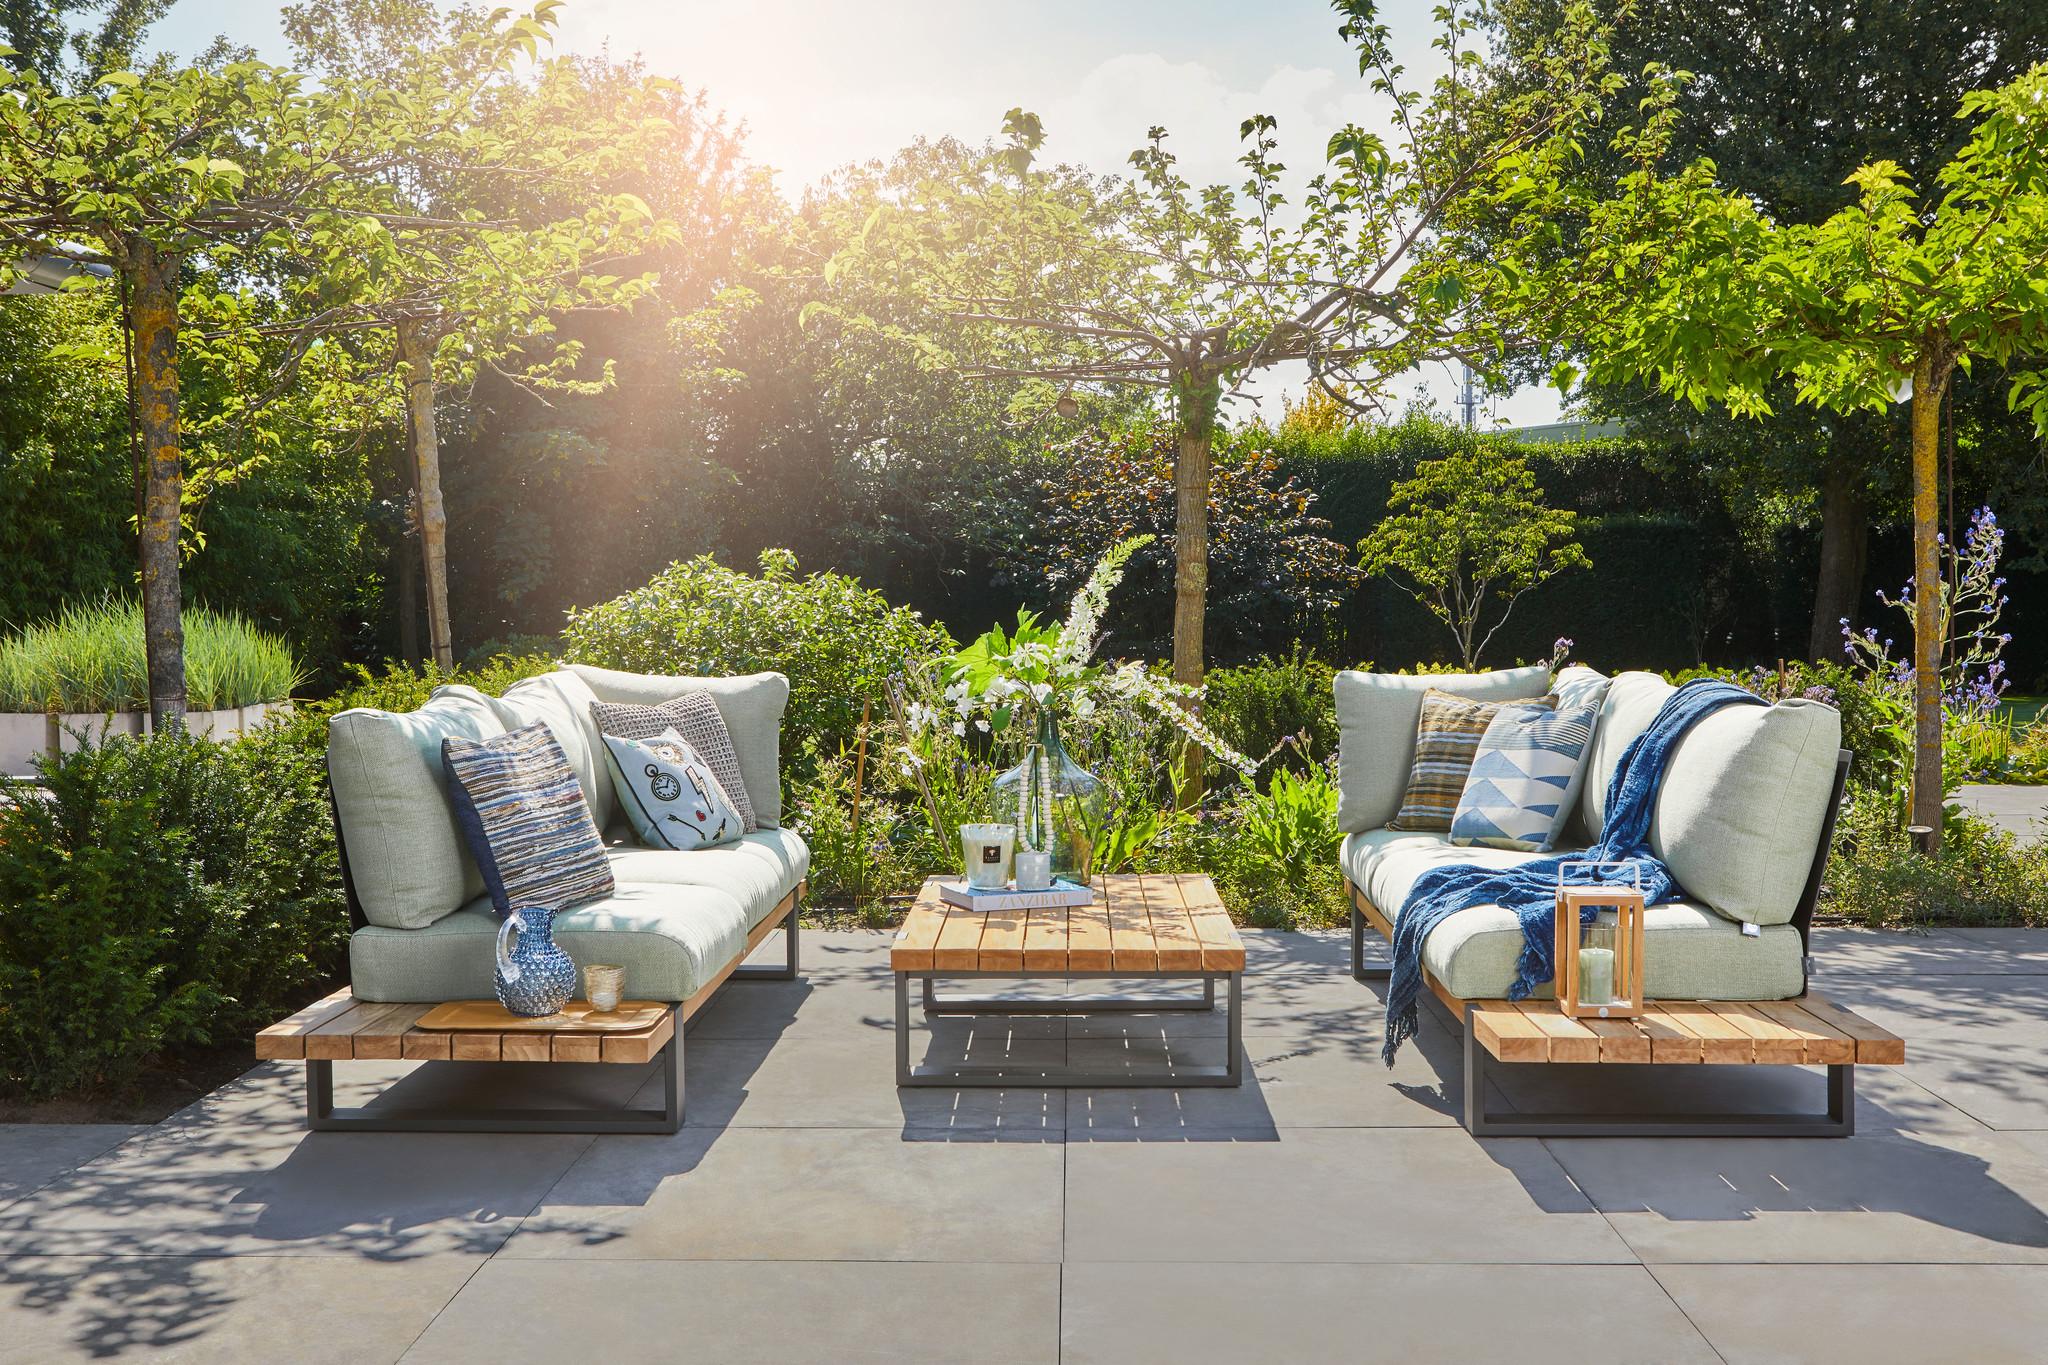 SUNS tuinmeubelen Nardo Sofaset | mat grijs